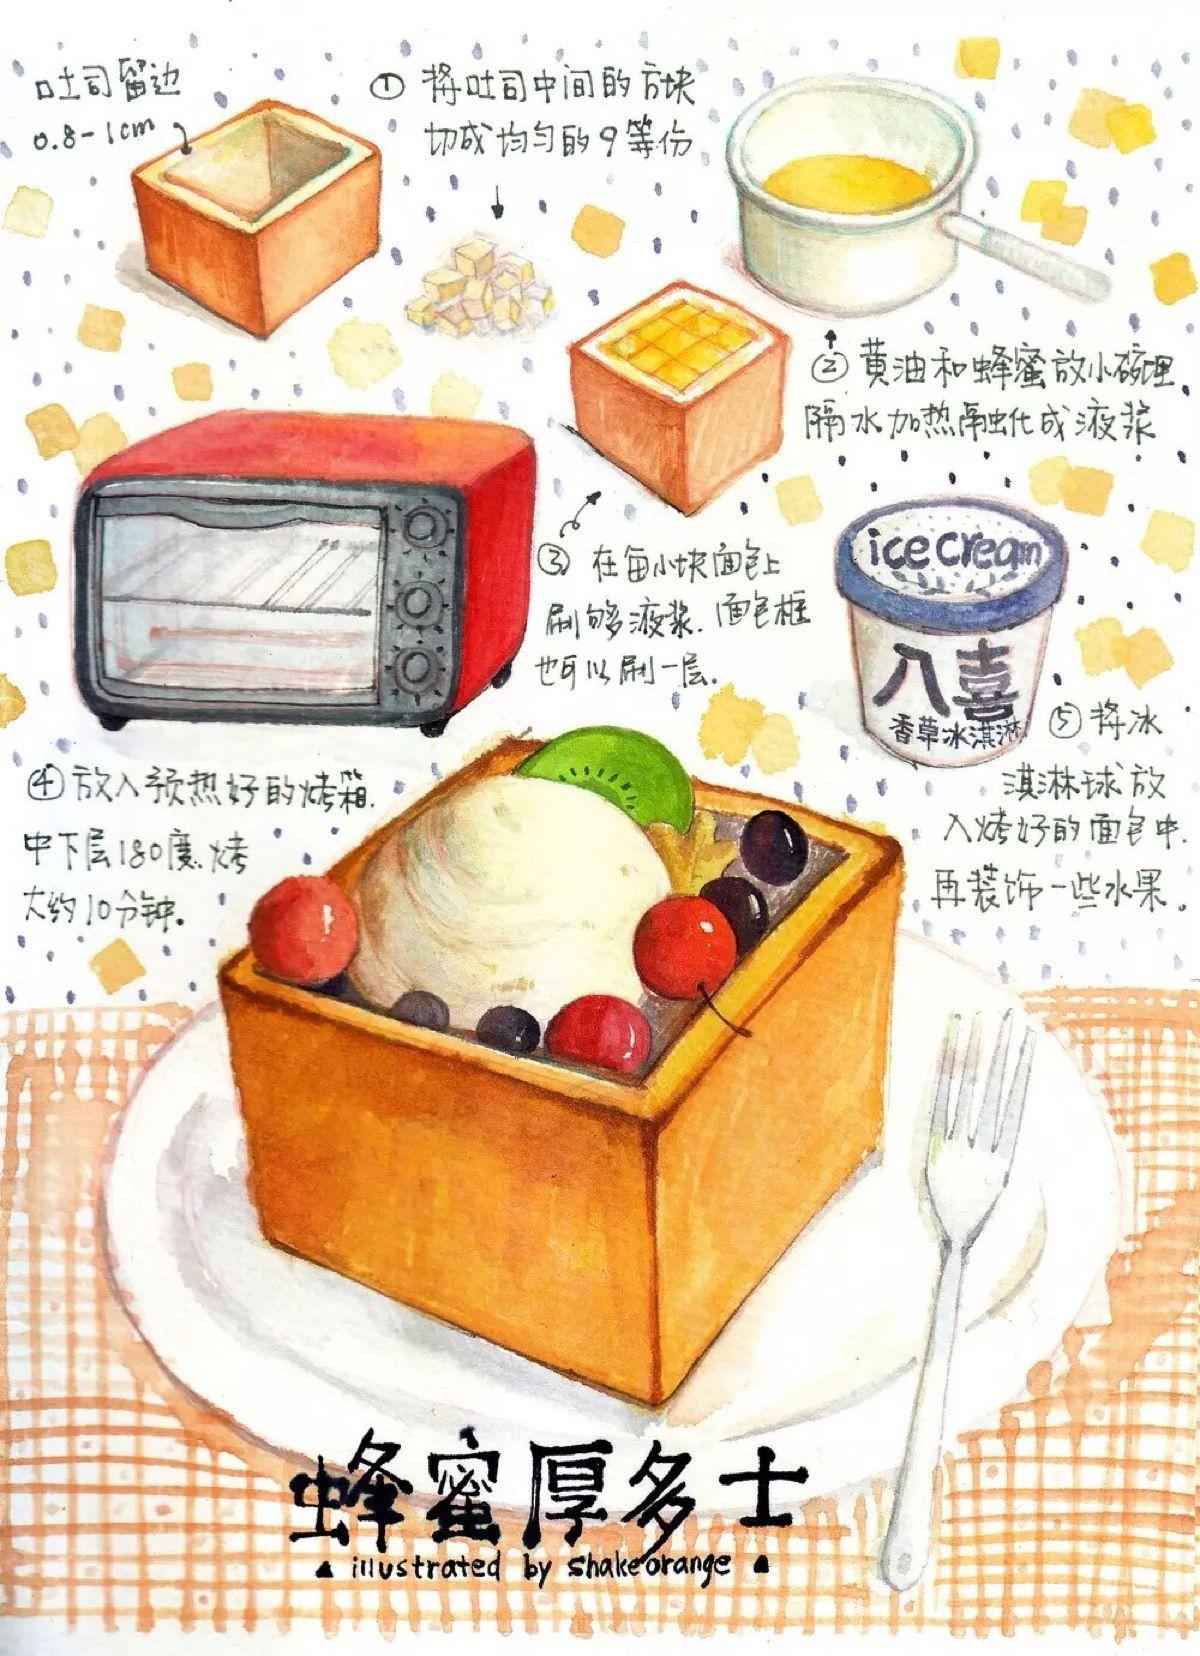 手绘插画美食 - google 搜尋 | 文創 | pinterest | 美食、插画、綺麗な